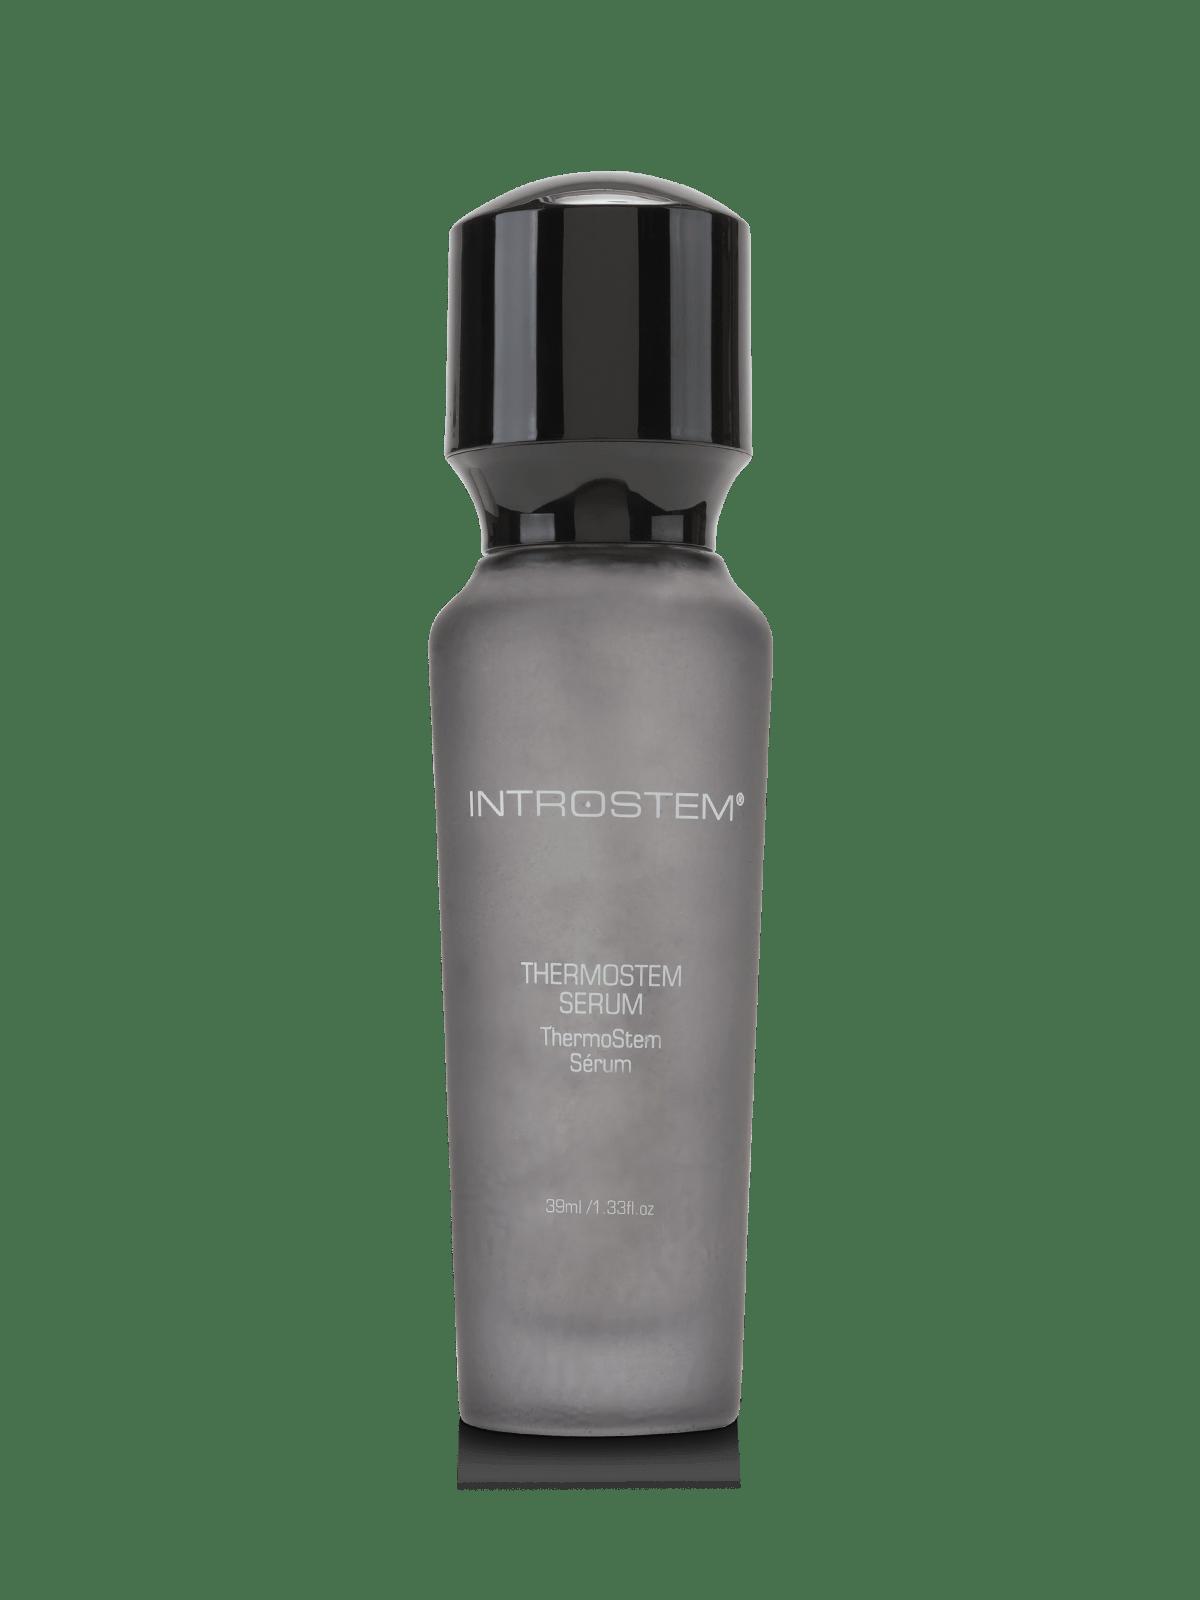 Thermostem-Serum